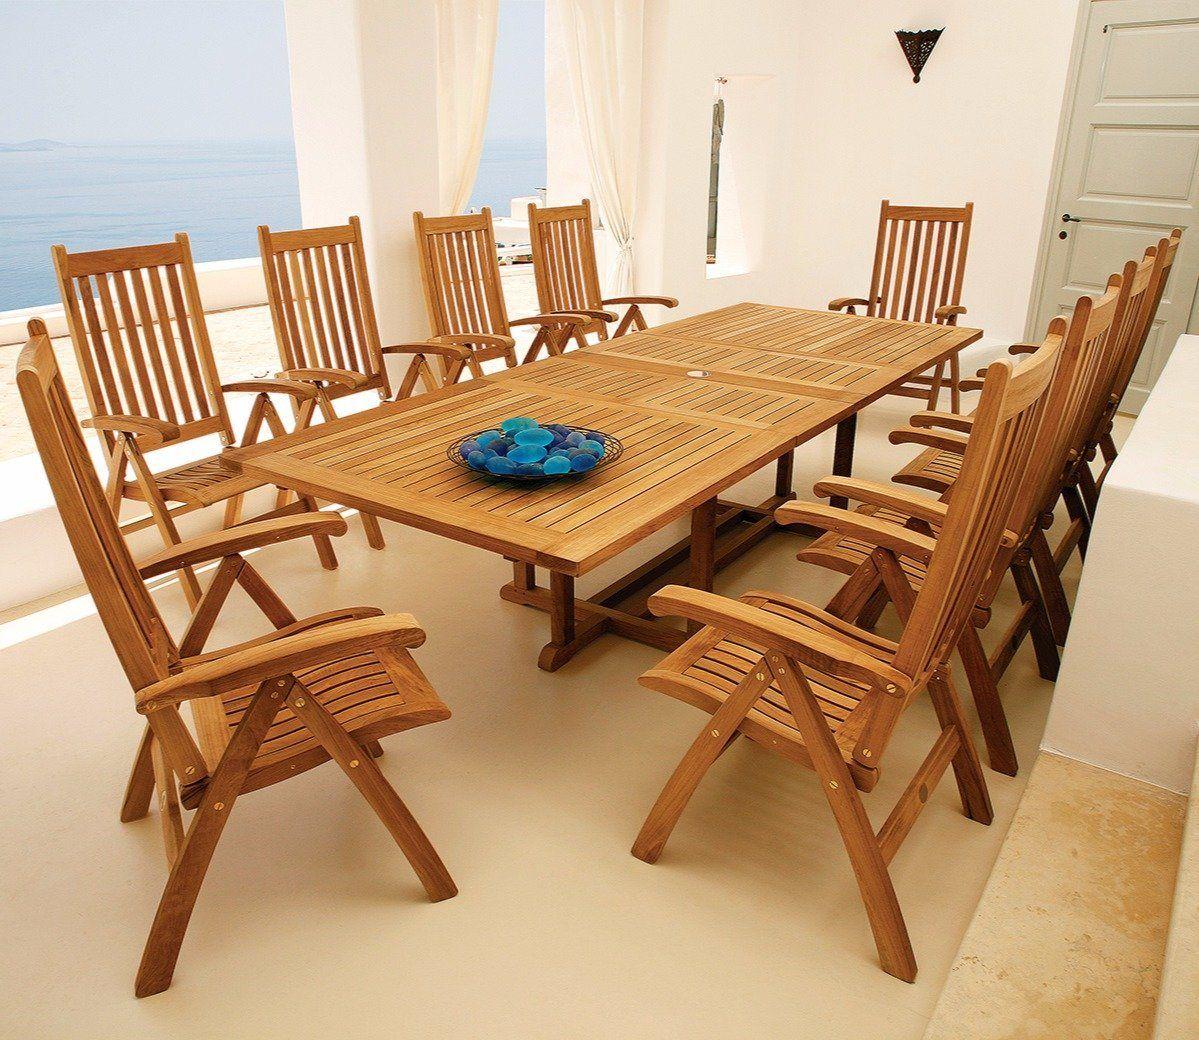 Barlow tyrie ascot u arundel seater dining set outdoor garden